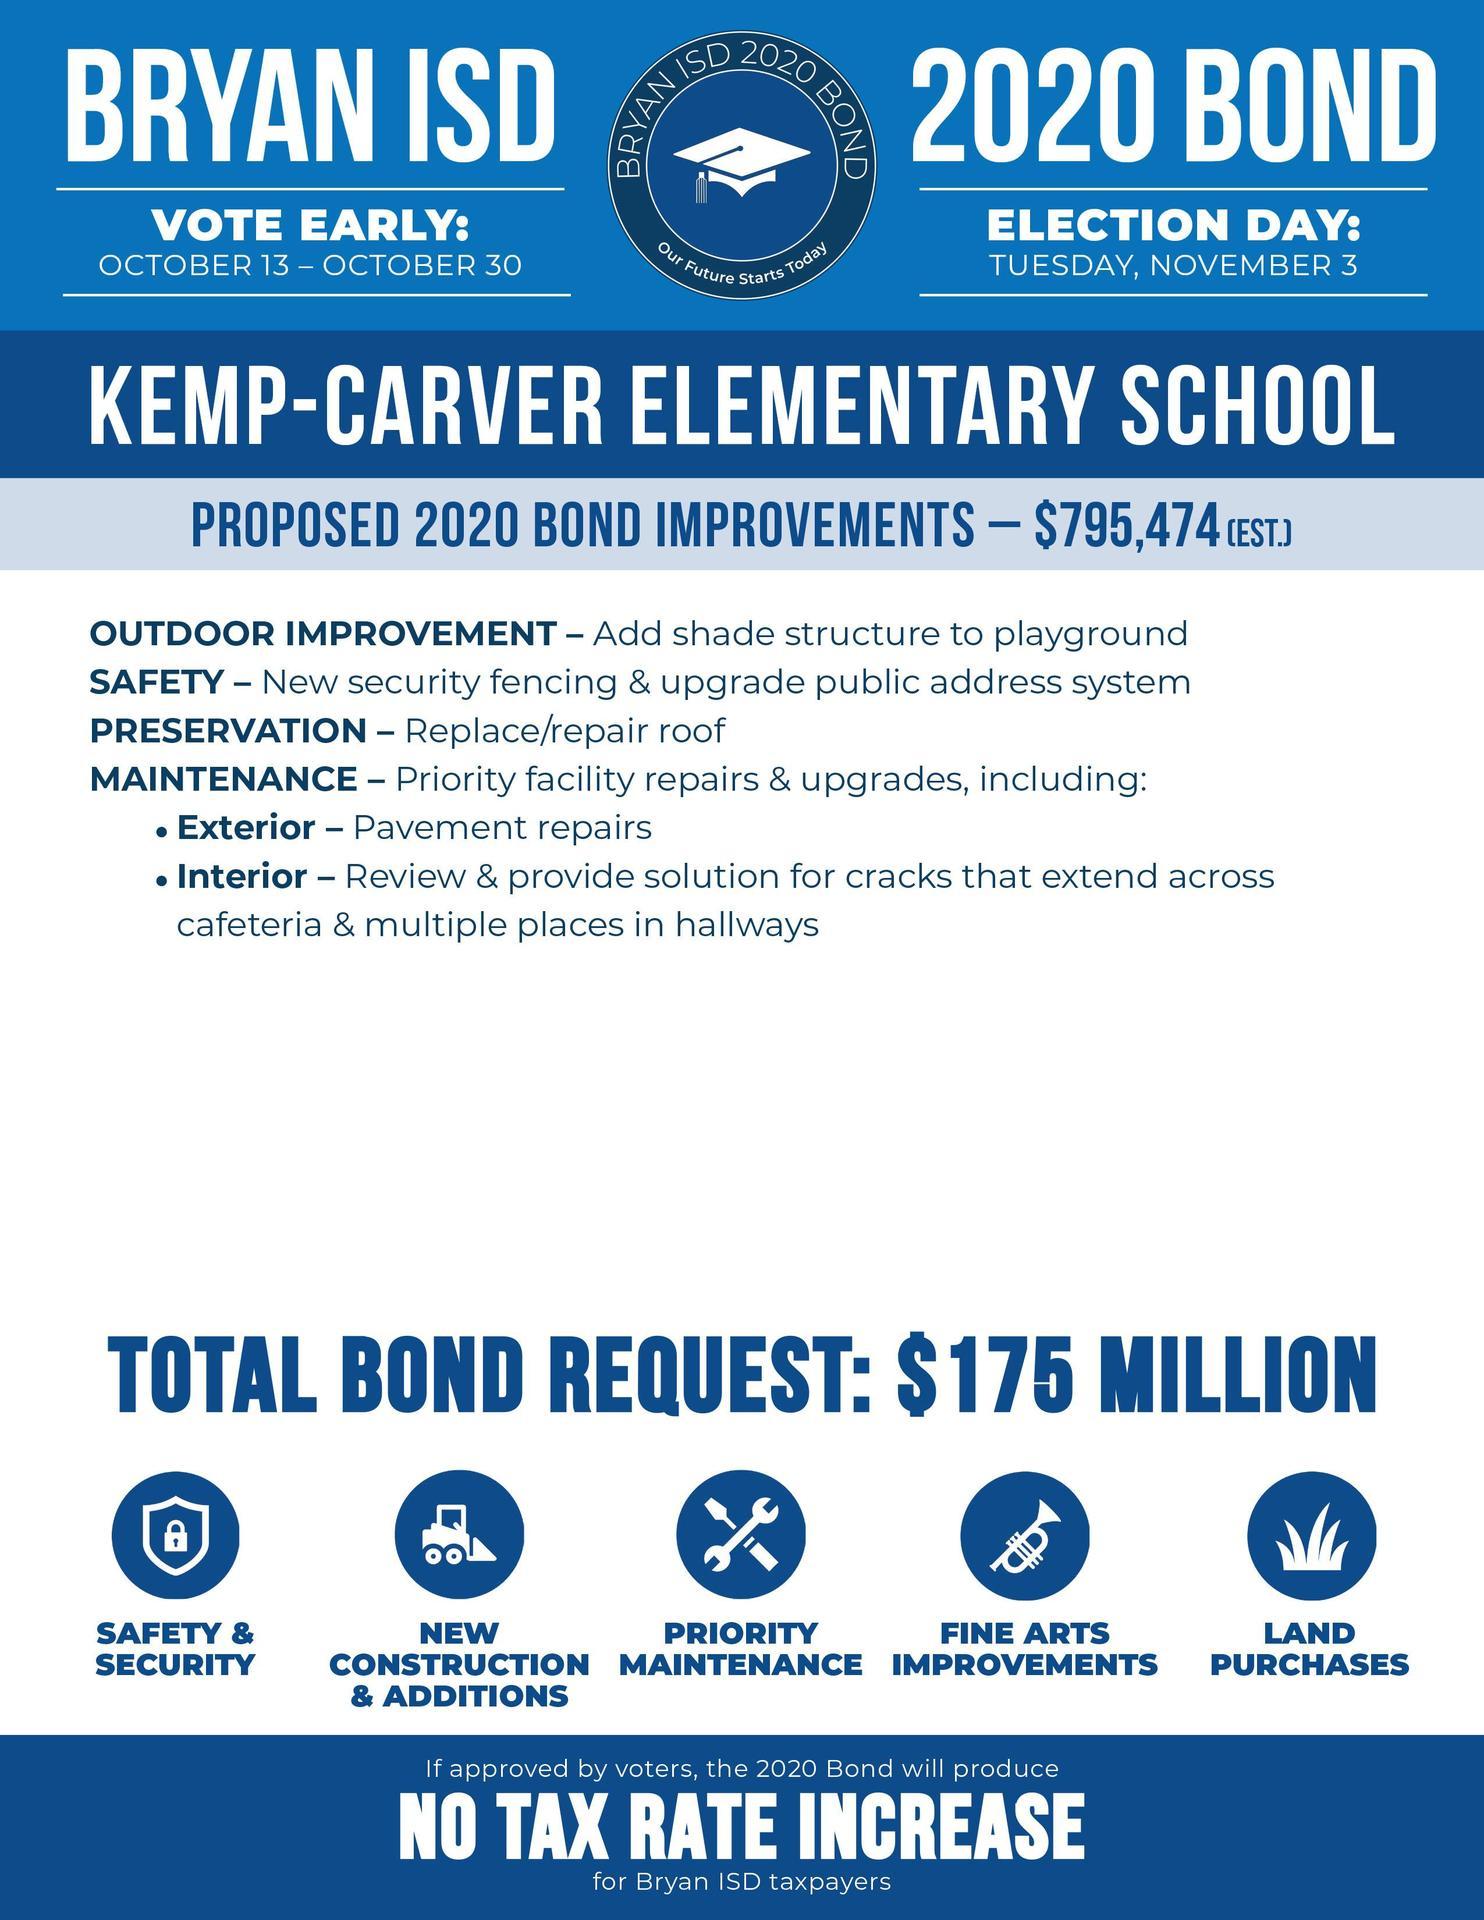 Kemp-Carver Elementary School